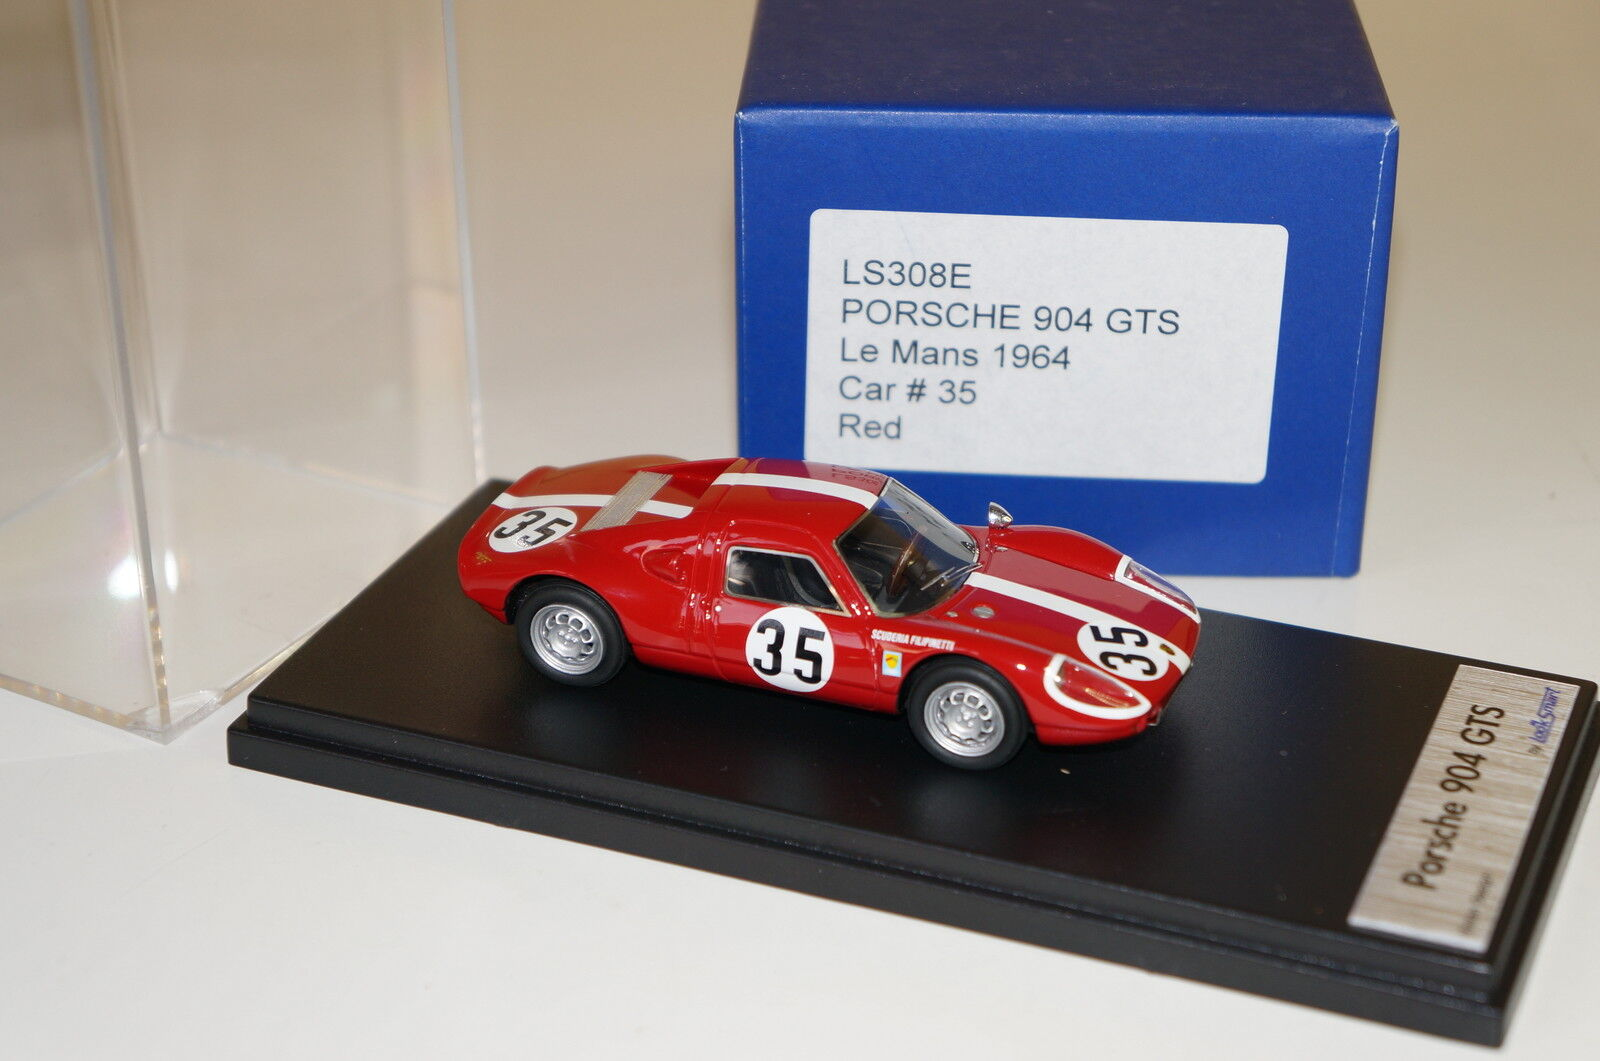 disegni esclusivi guardaSMART PORSCHE PORSCHE PORSCHE 904 GTS  35 LE uomoS 1964 rosso 1 43  n ° 1 online